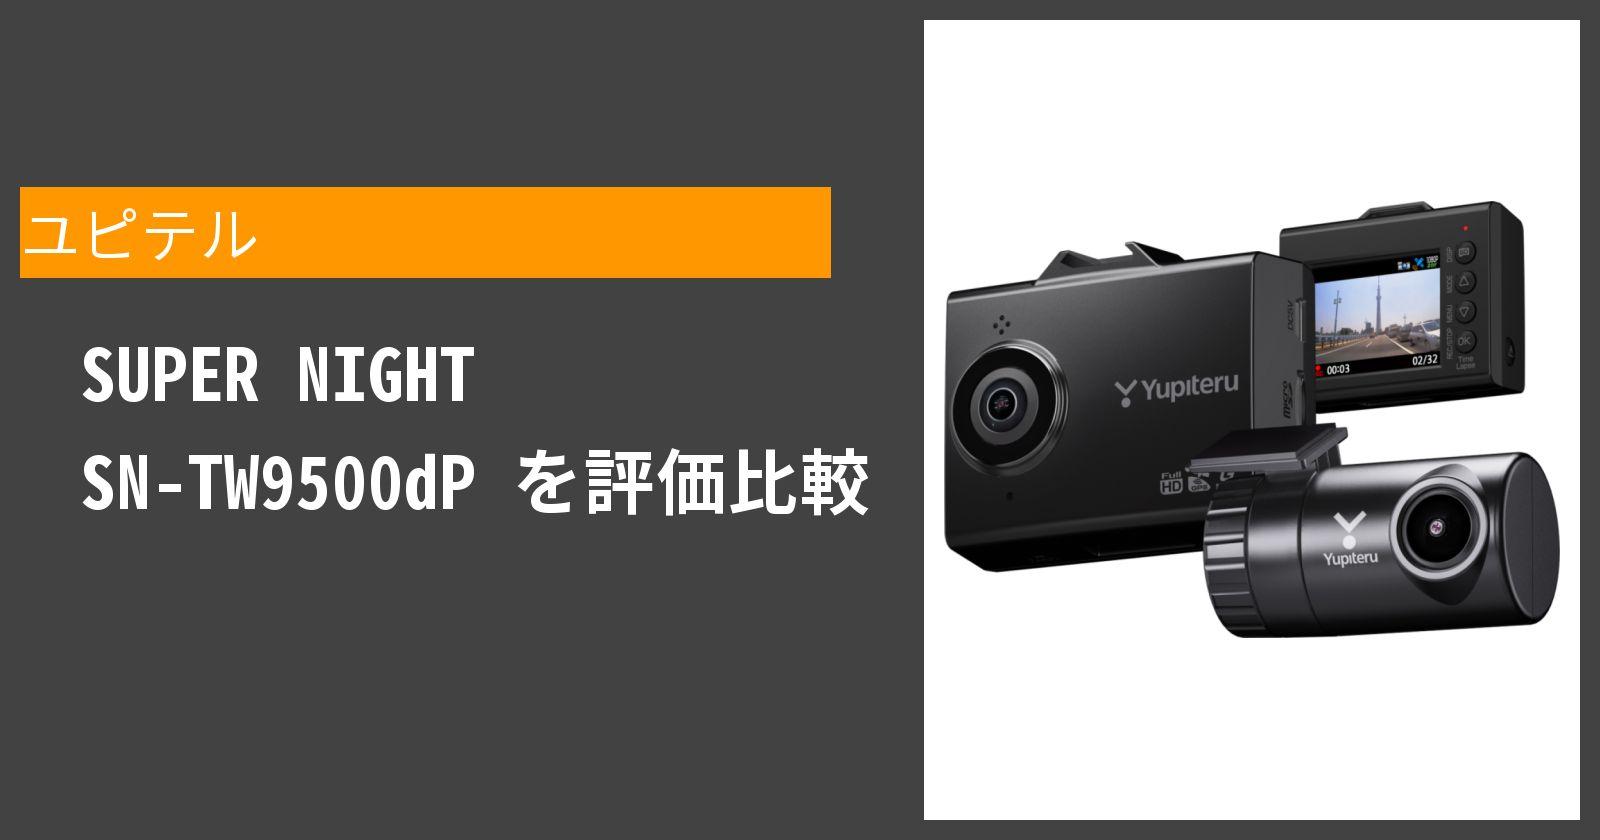 SUPER NIGHT SN-TW9500dPを徹底評価